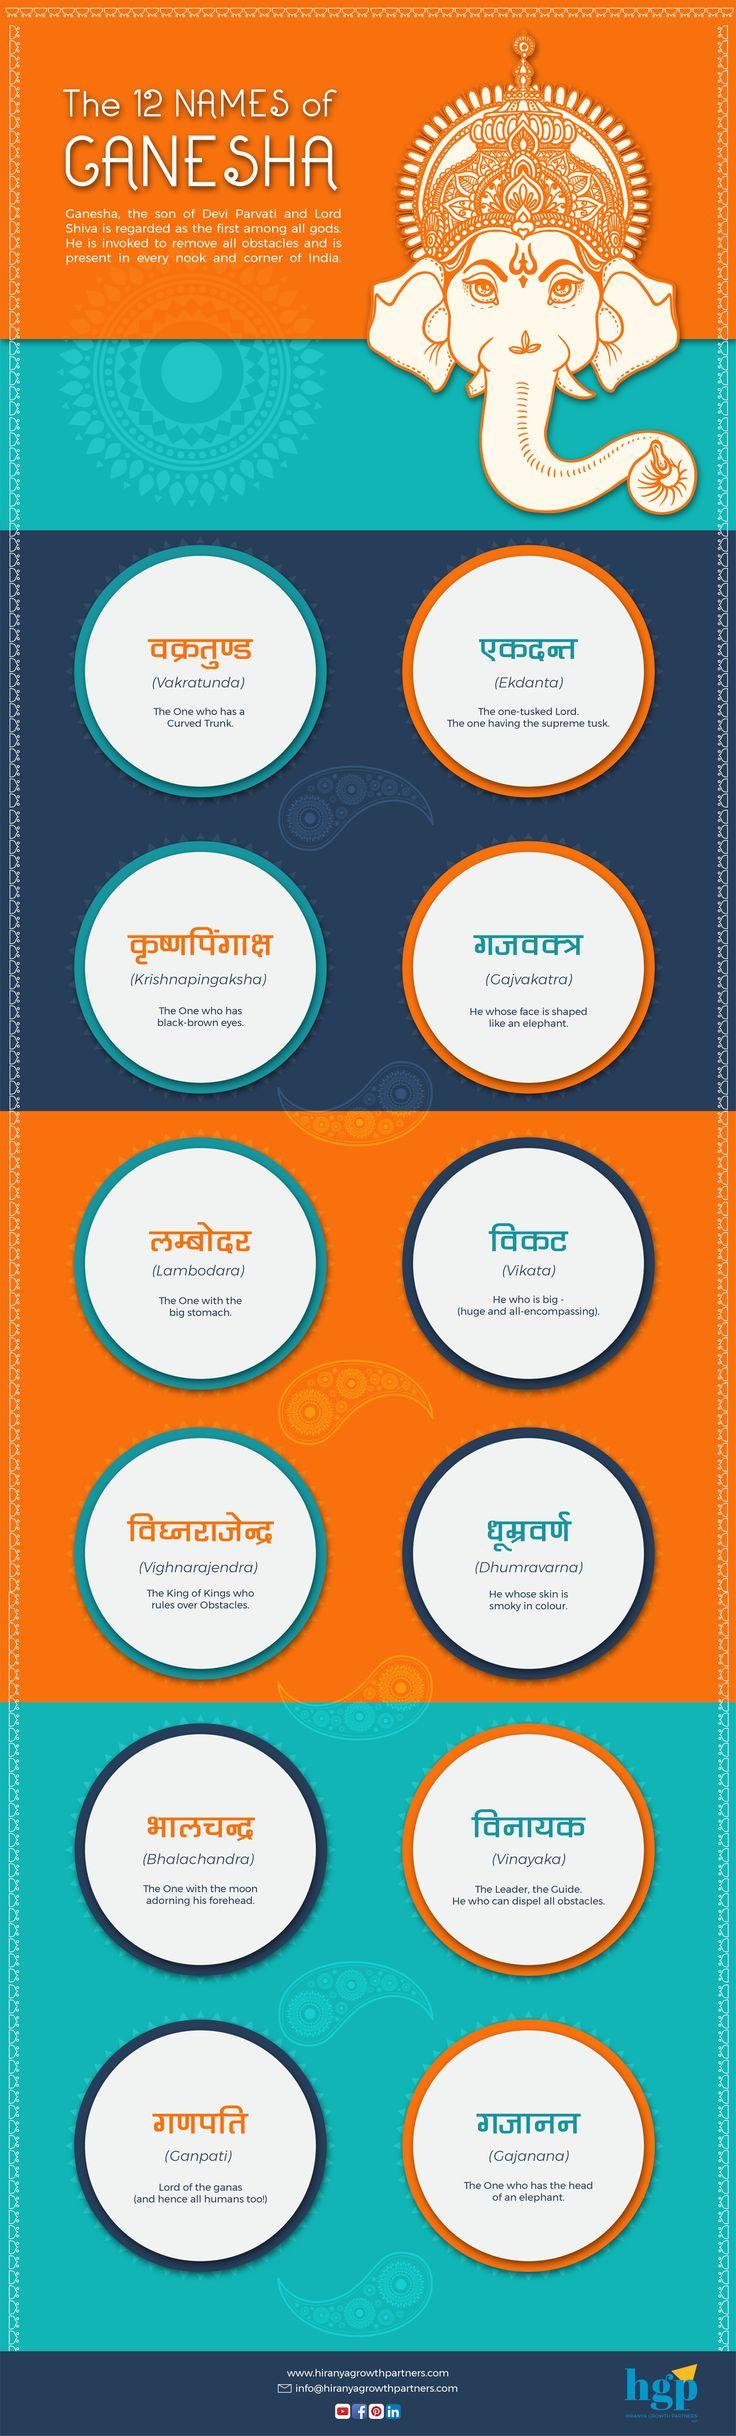 The 12 Names of Ganesha